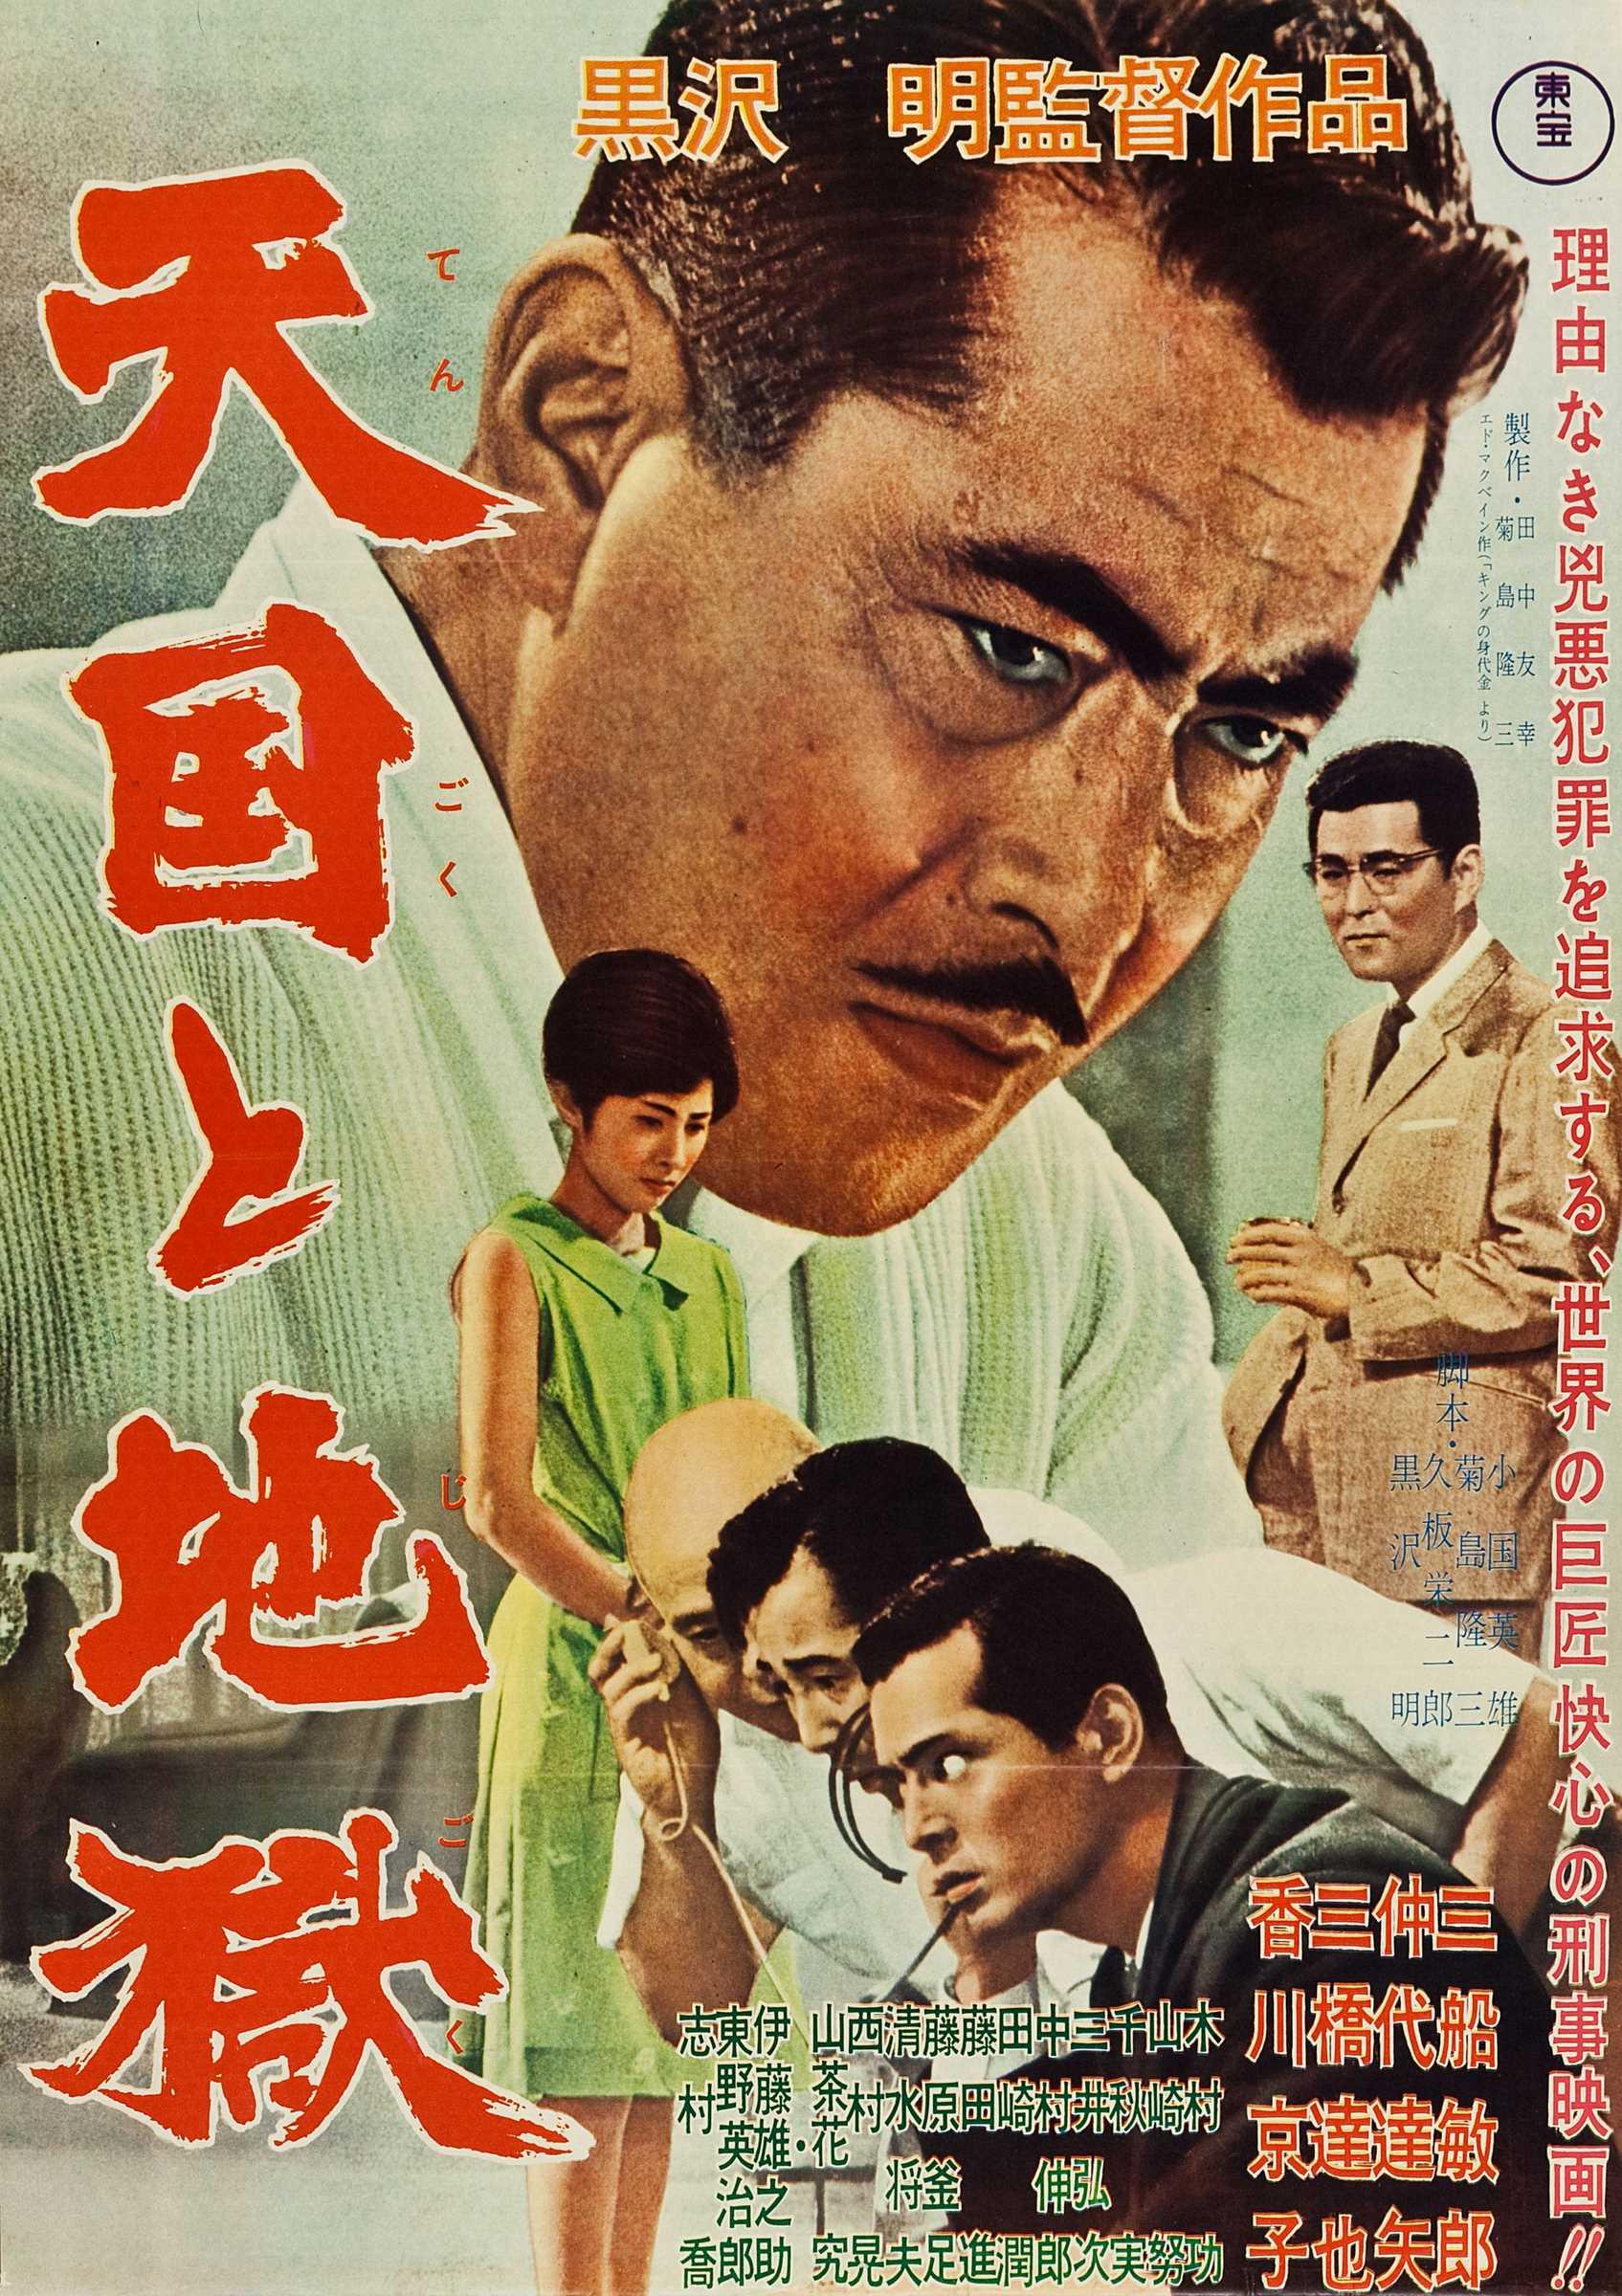 Entre le ciel et l'enfer (1963) d'Akira Kurosawa